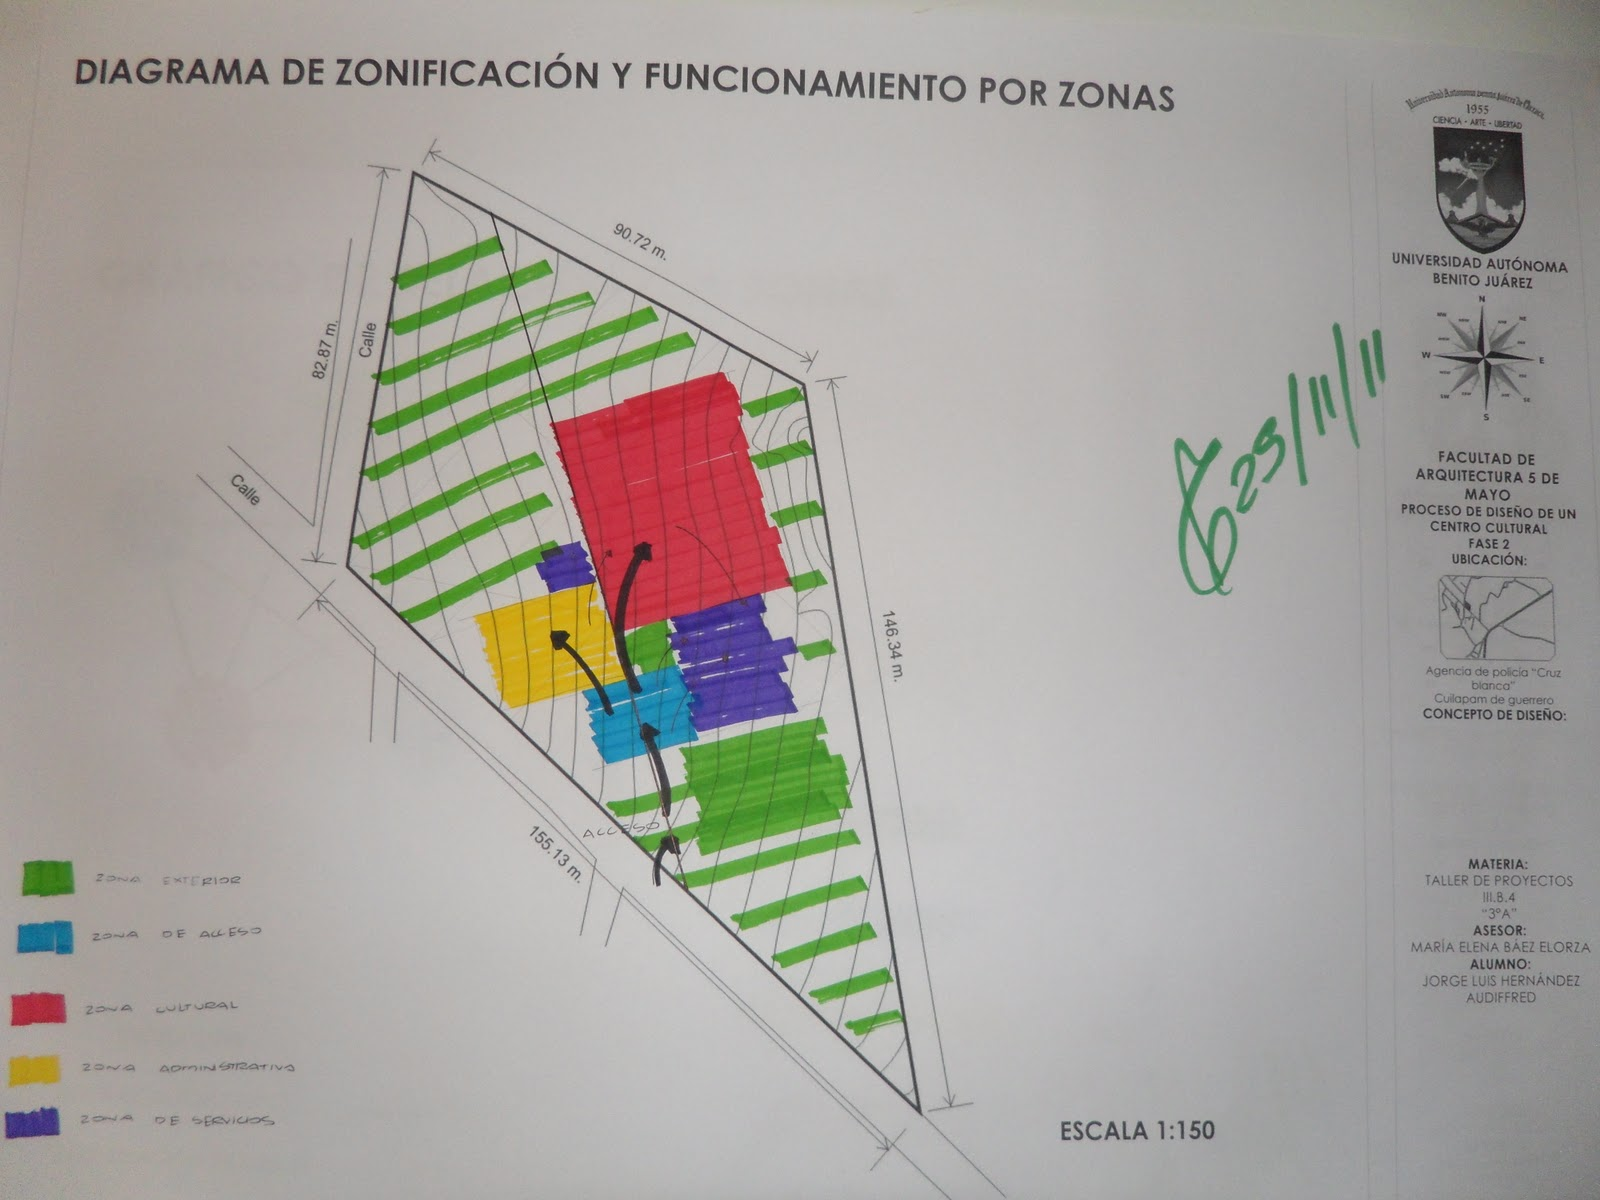 proceso de dise o arquitectonico de un centro cultural On zonificacion arquitectonica